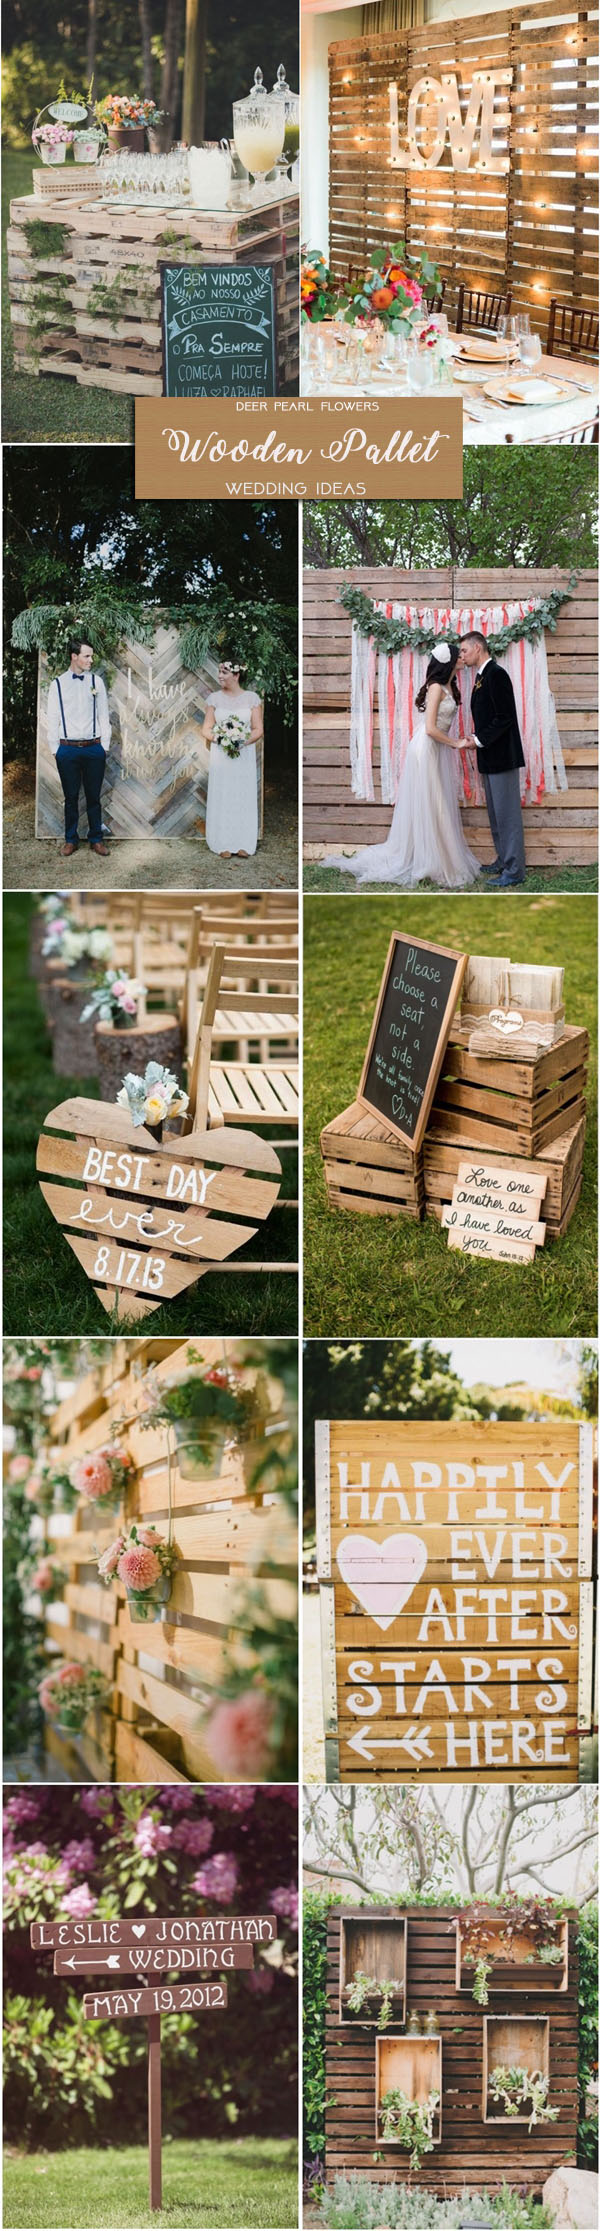 20 stunning rustic edison bulbs wedding decor ideas